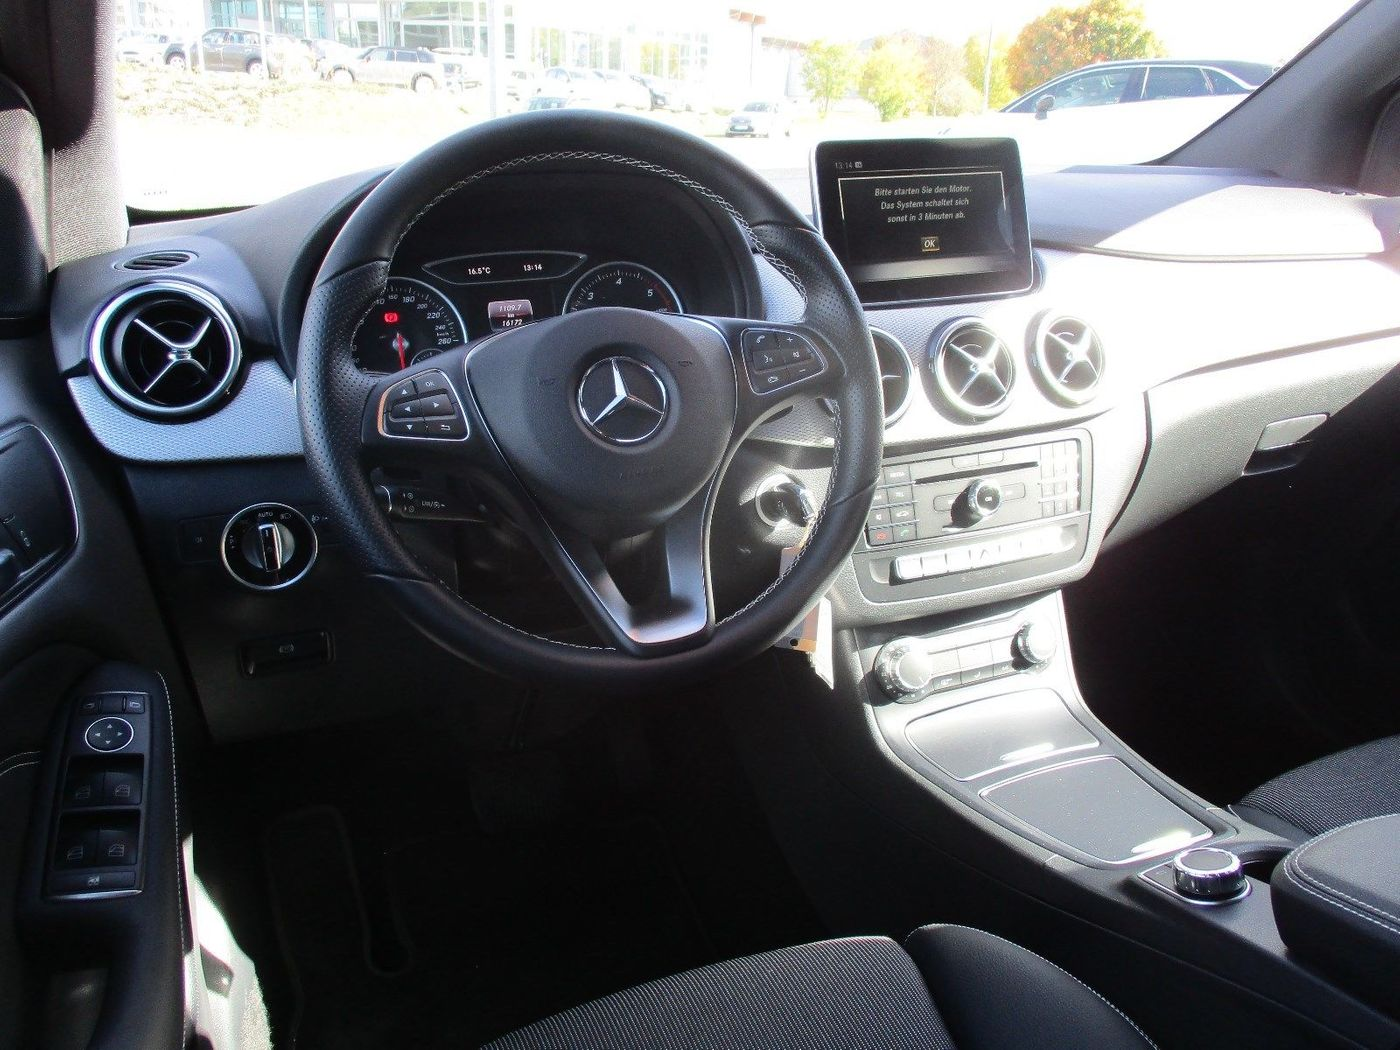 Mercedes-Benz B-Klasse B 180 CDI /AHK/LED | Vorführwagen | Bus | 410655